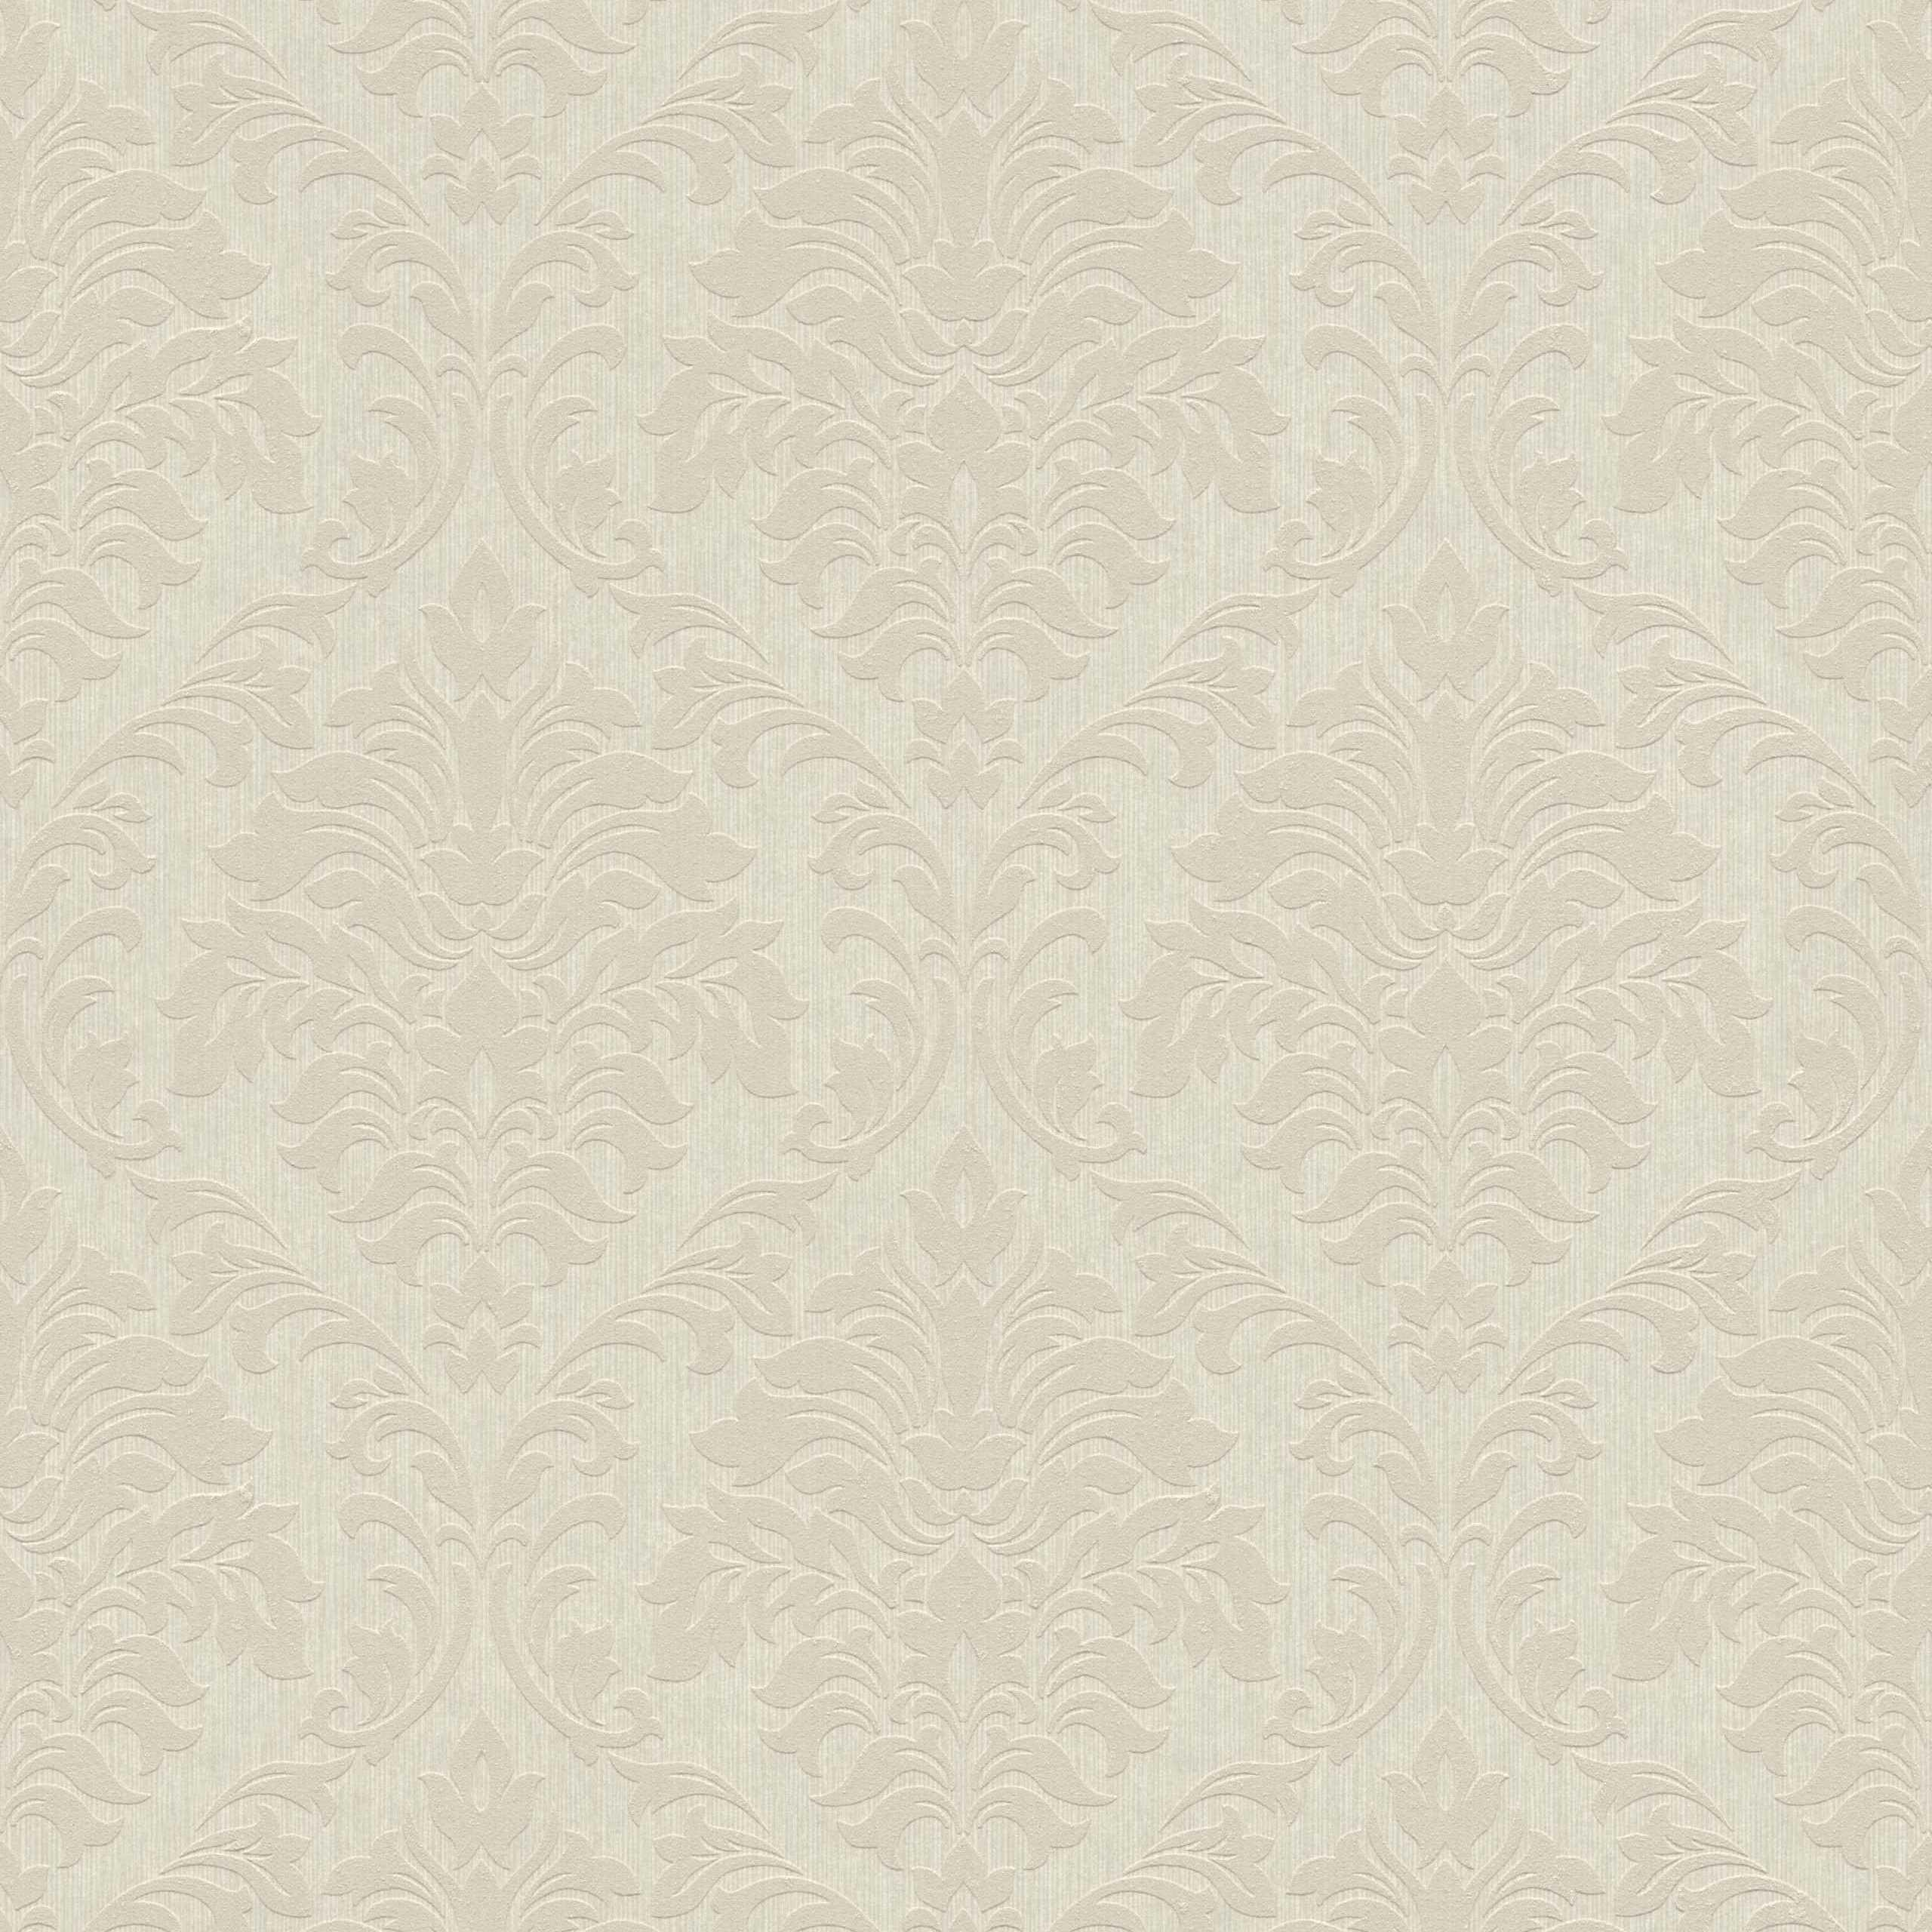 Rasch-Textil Vlies-Tapete Kollektion 'Juno' 096101 Barock-Dekor